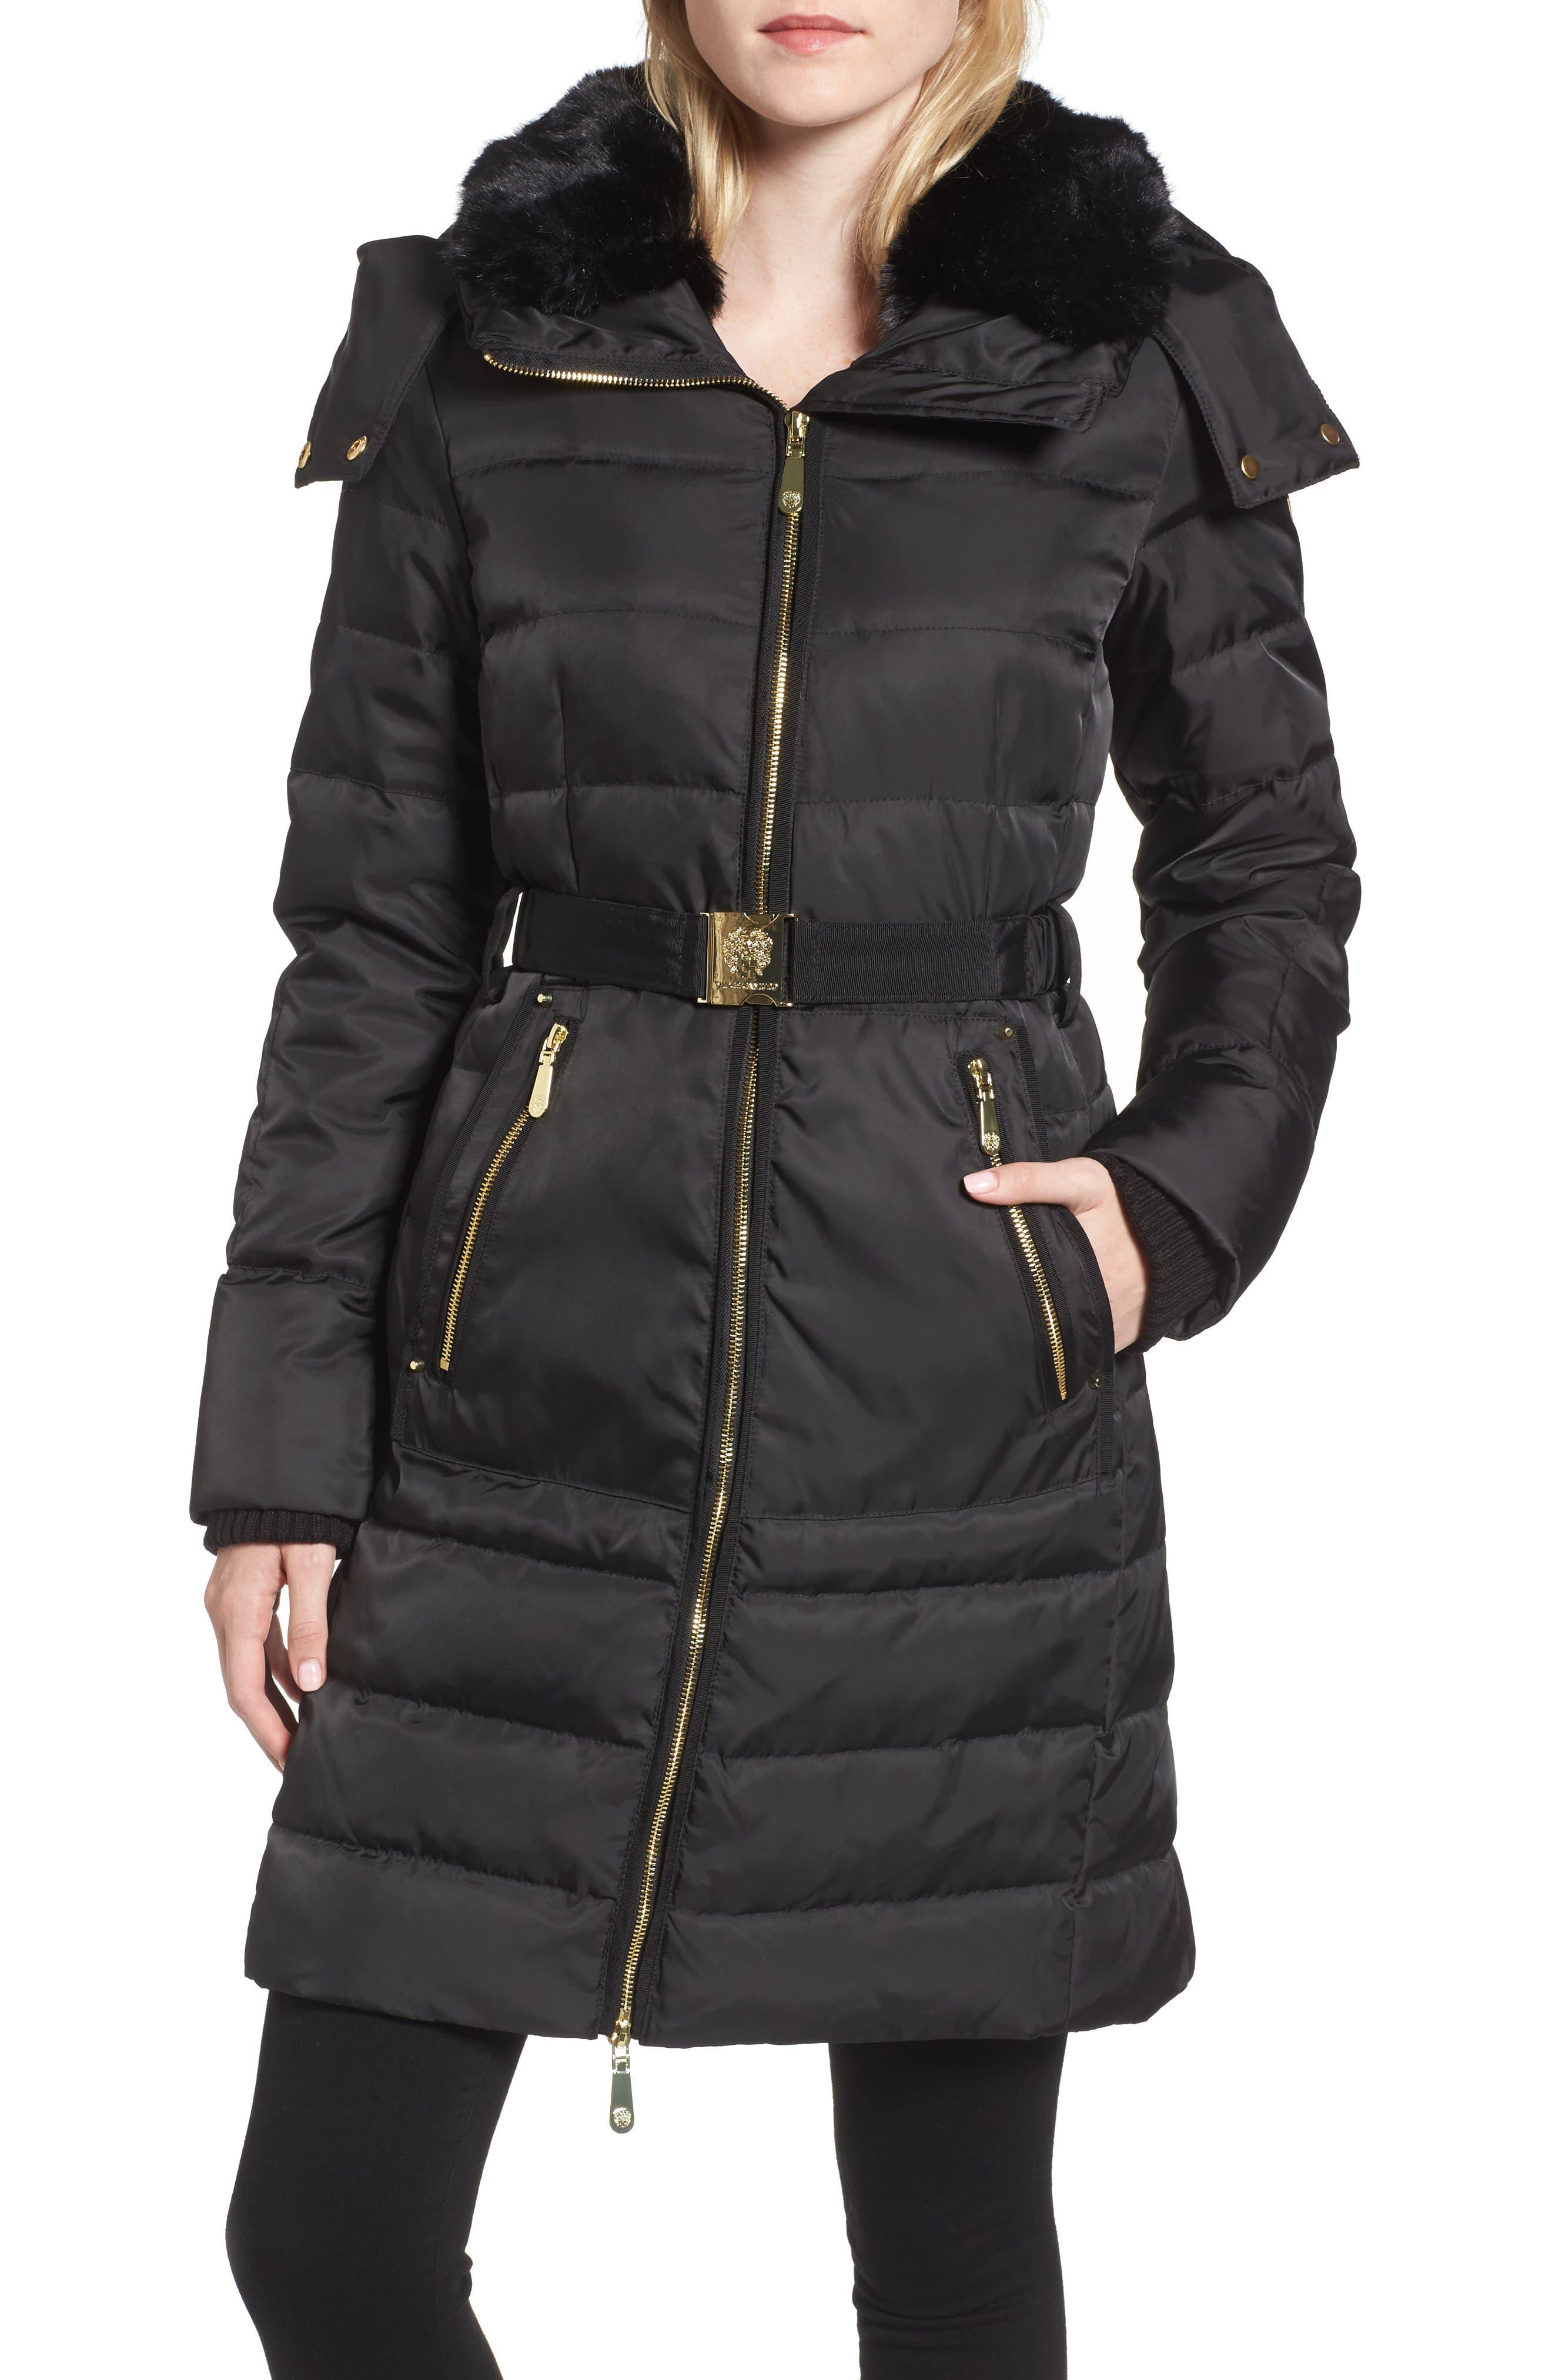 Belted Coat with Detachable Faux Fur,                         Main,                         color, Black